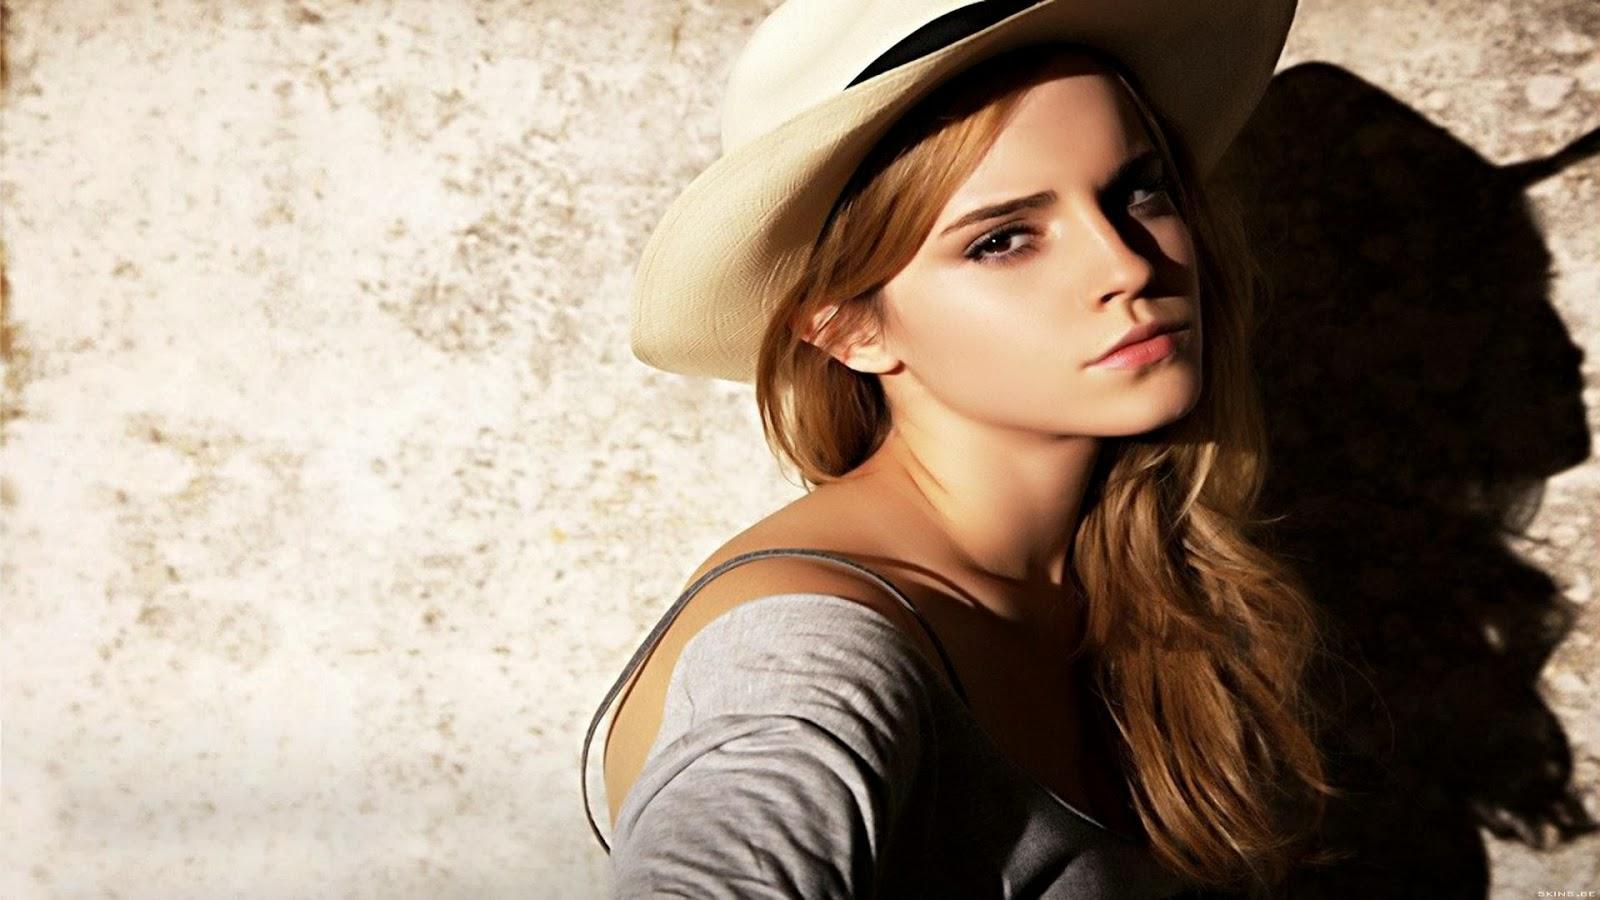 Latest Emma Watson HD Wallpapers 2014